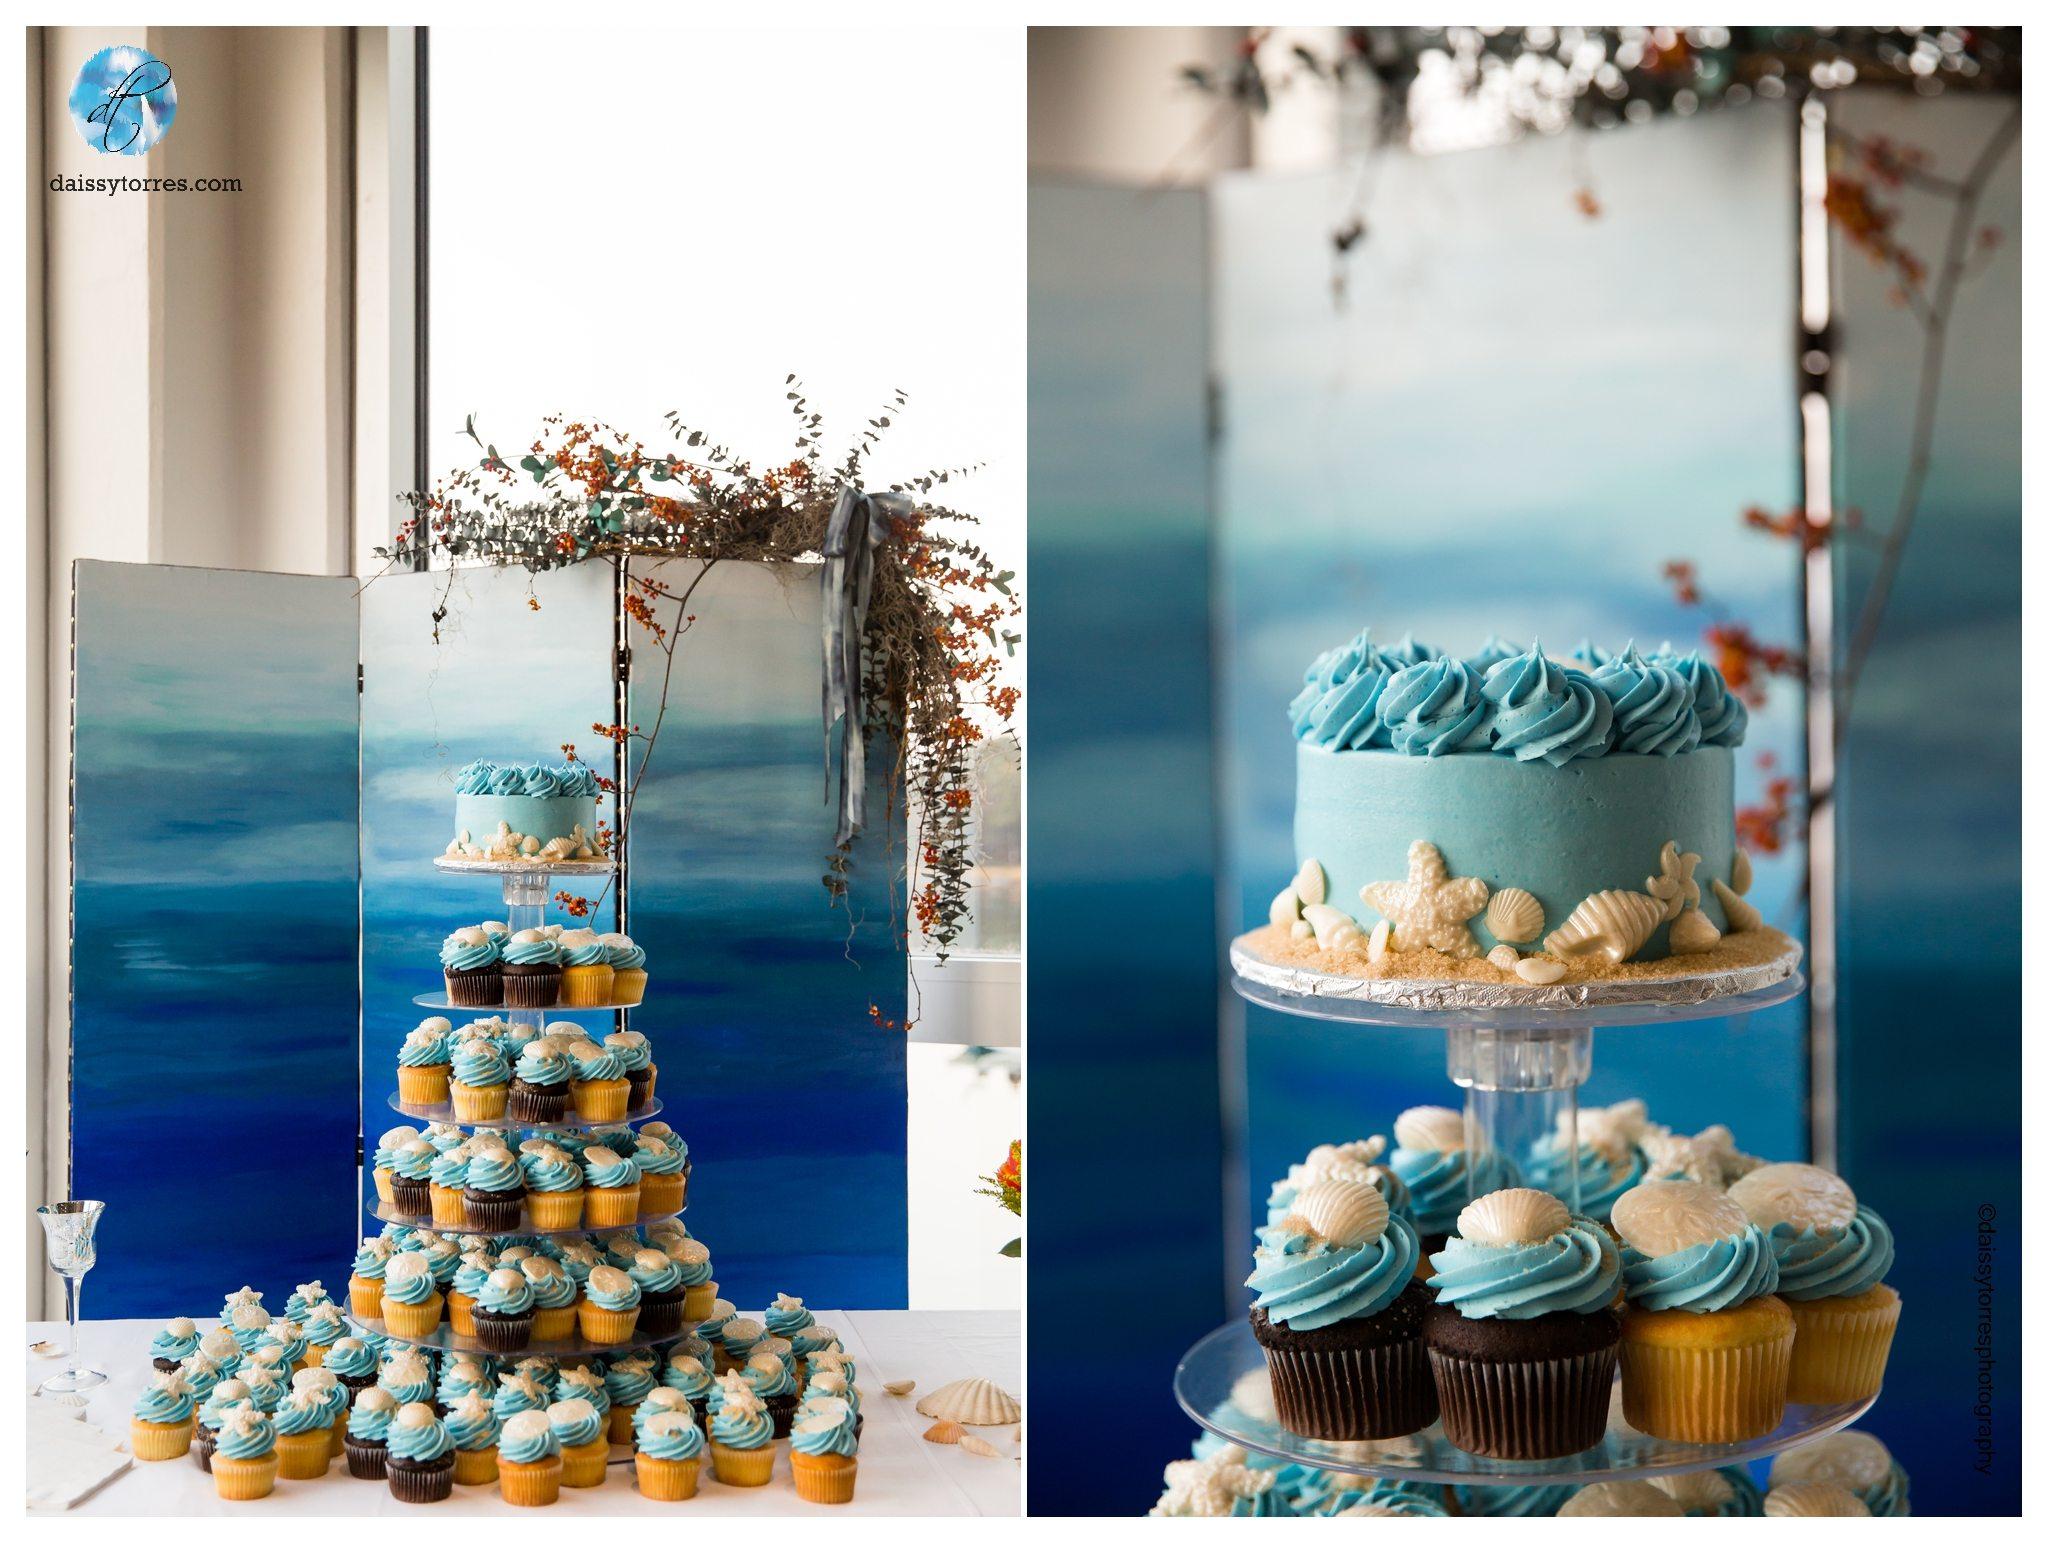 Virginia Aquarium Wedding - Cake and Cupcakes by Sugar Plum Bakery